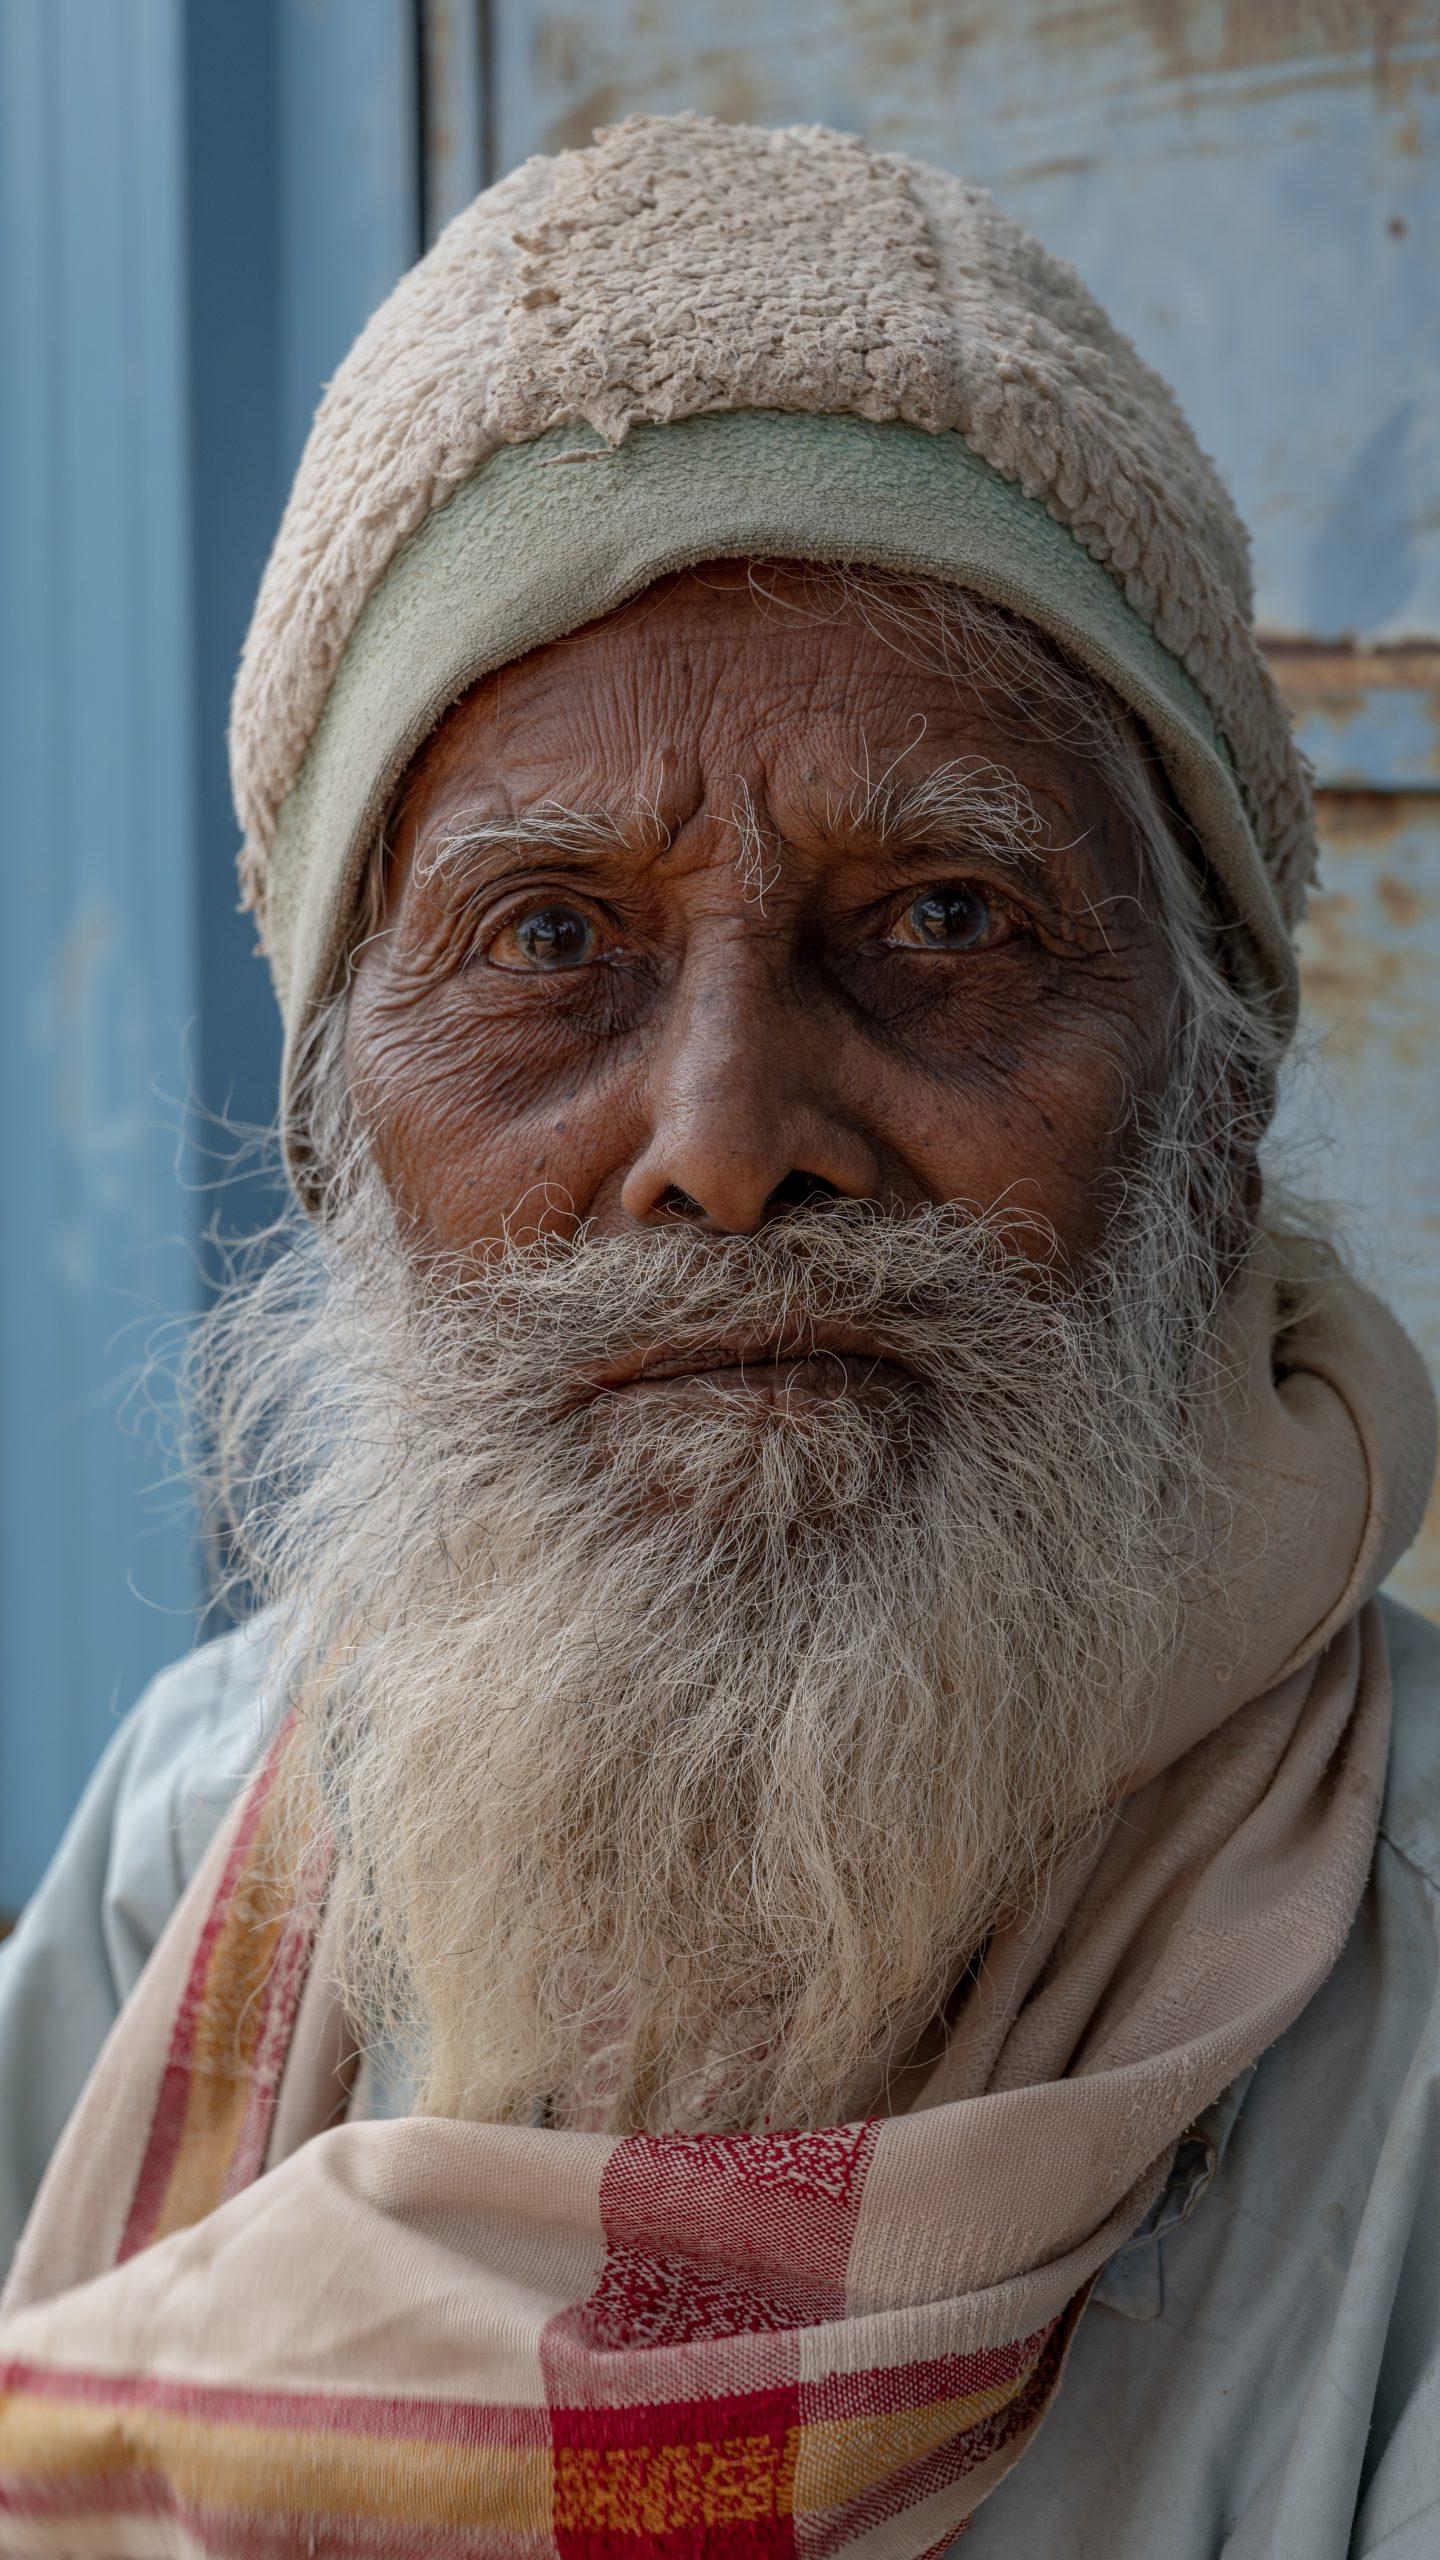 Old man with grey beard